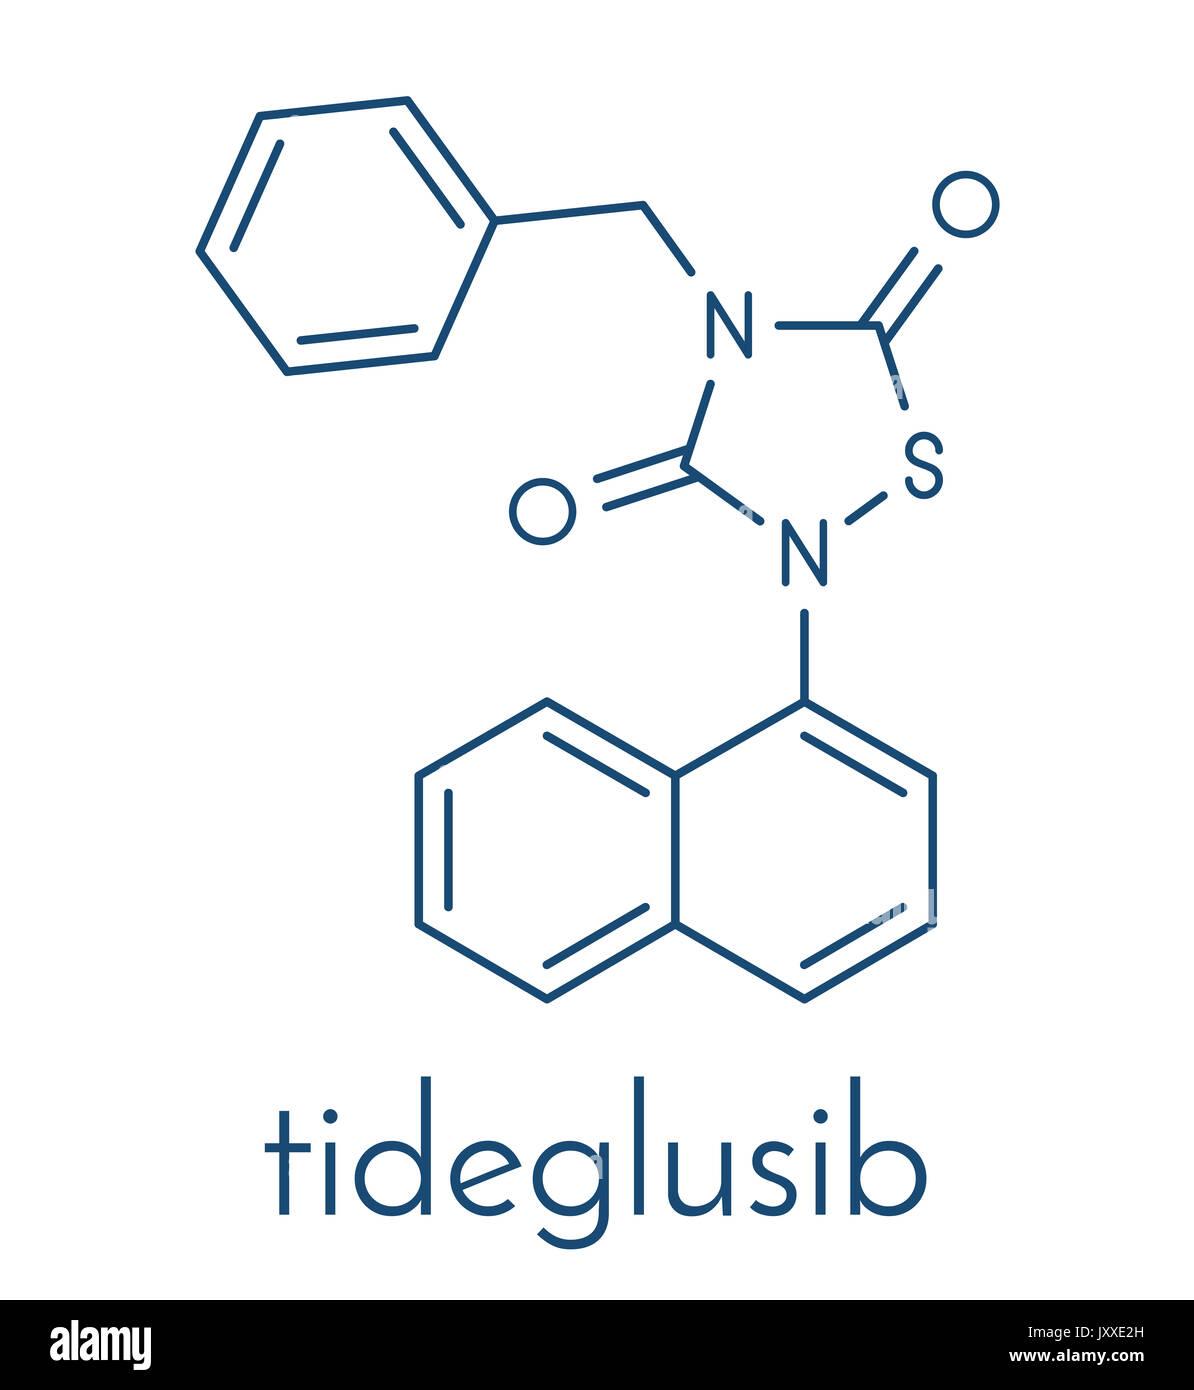 Gsk cut out stock images pictures alamy tideglusib drug molecule gsk 3 inhibitor skeletal formula stock image biocorpaavc Gallery